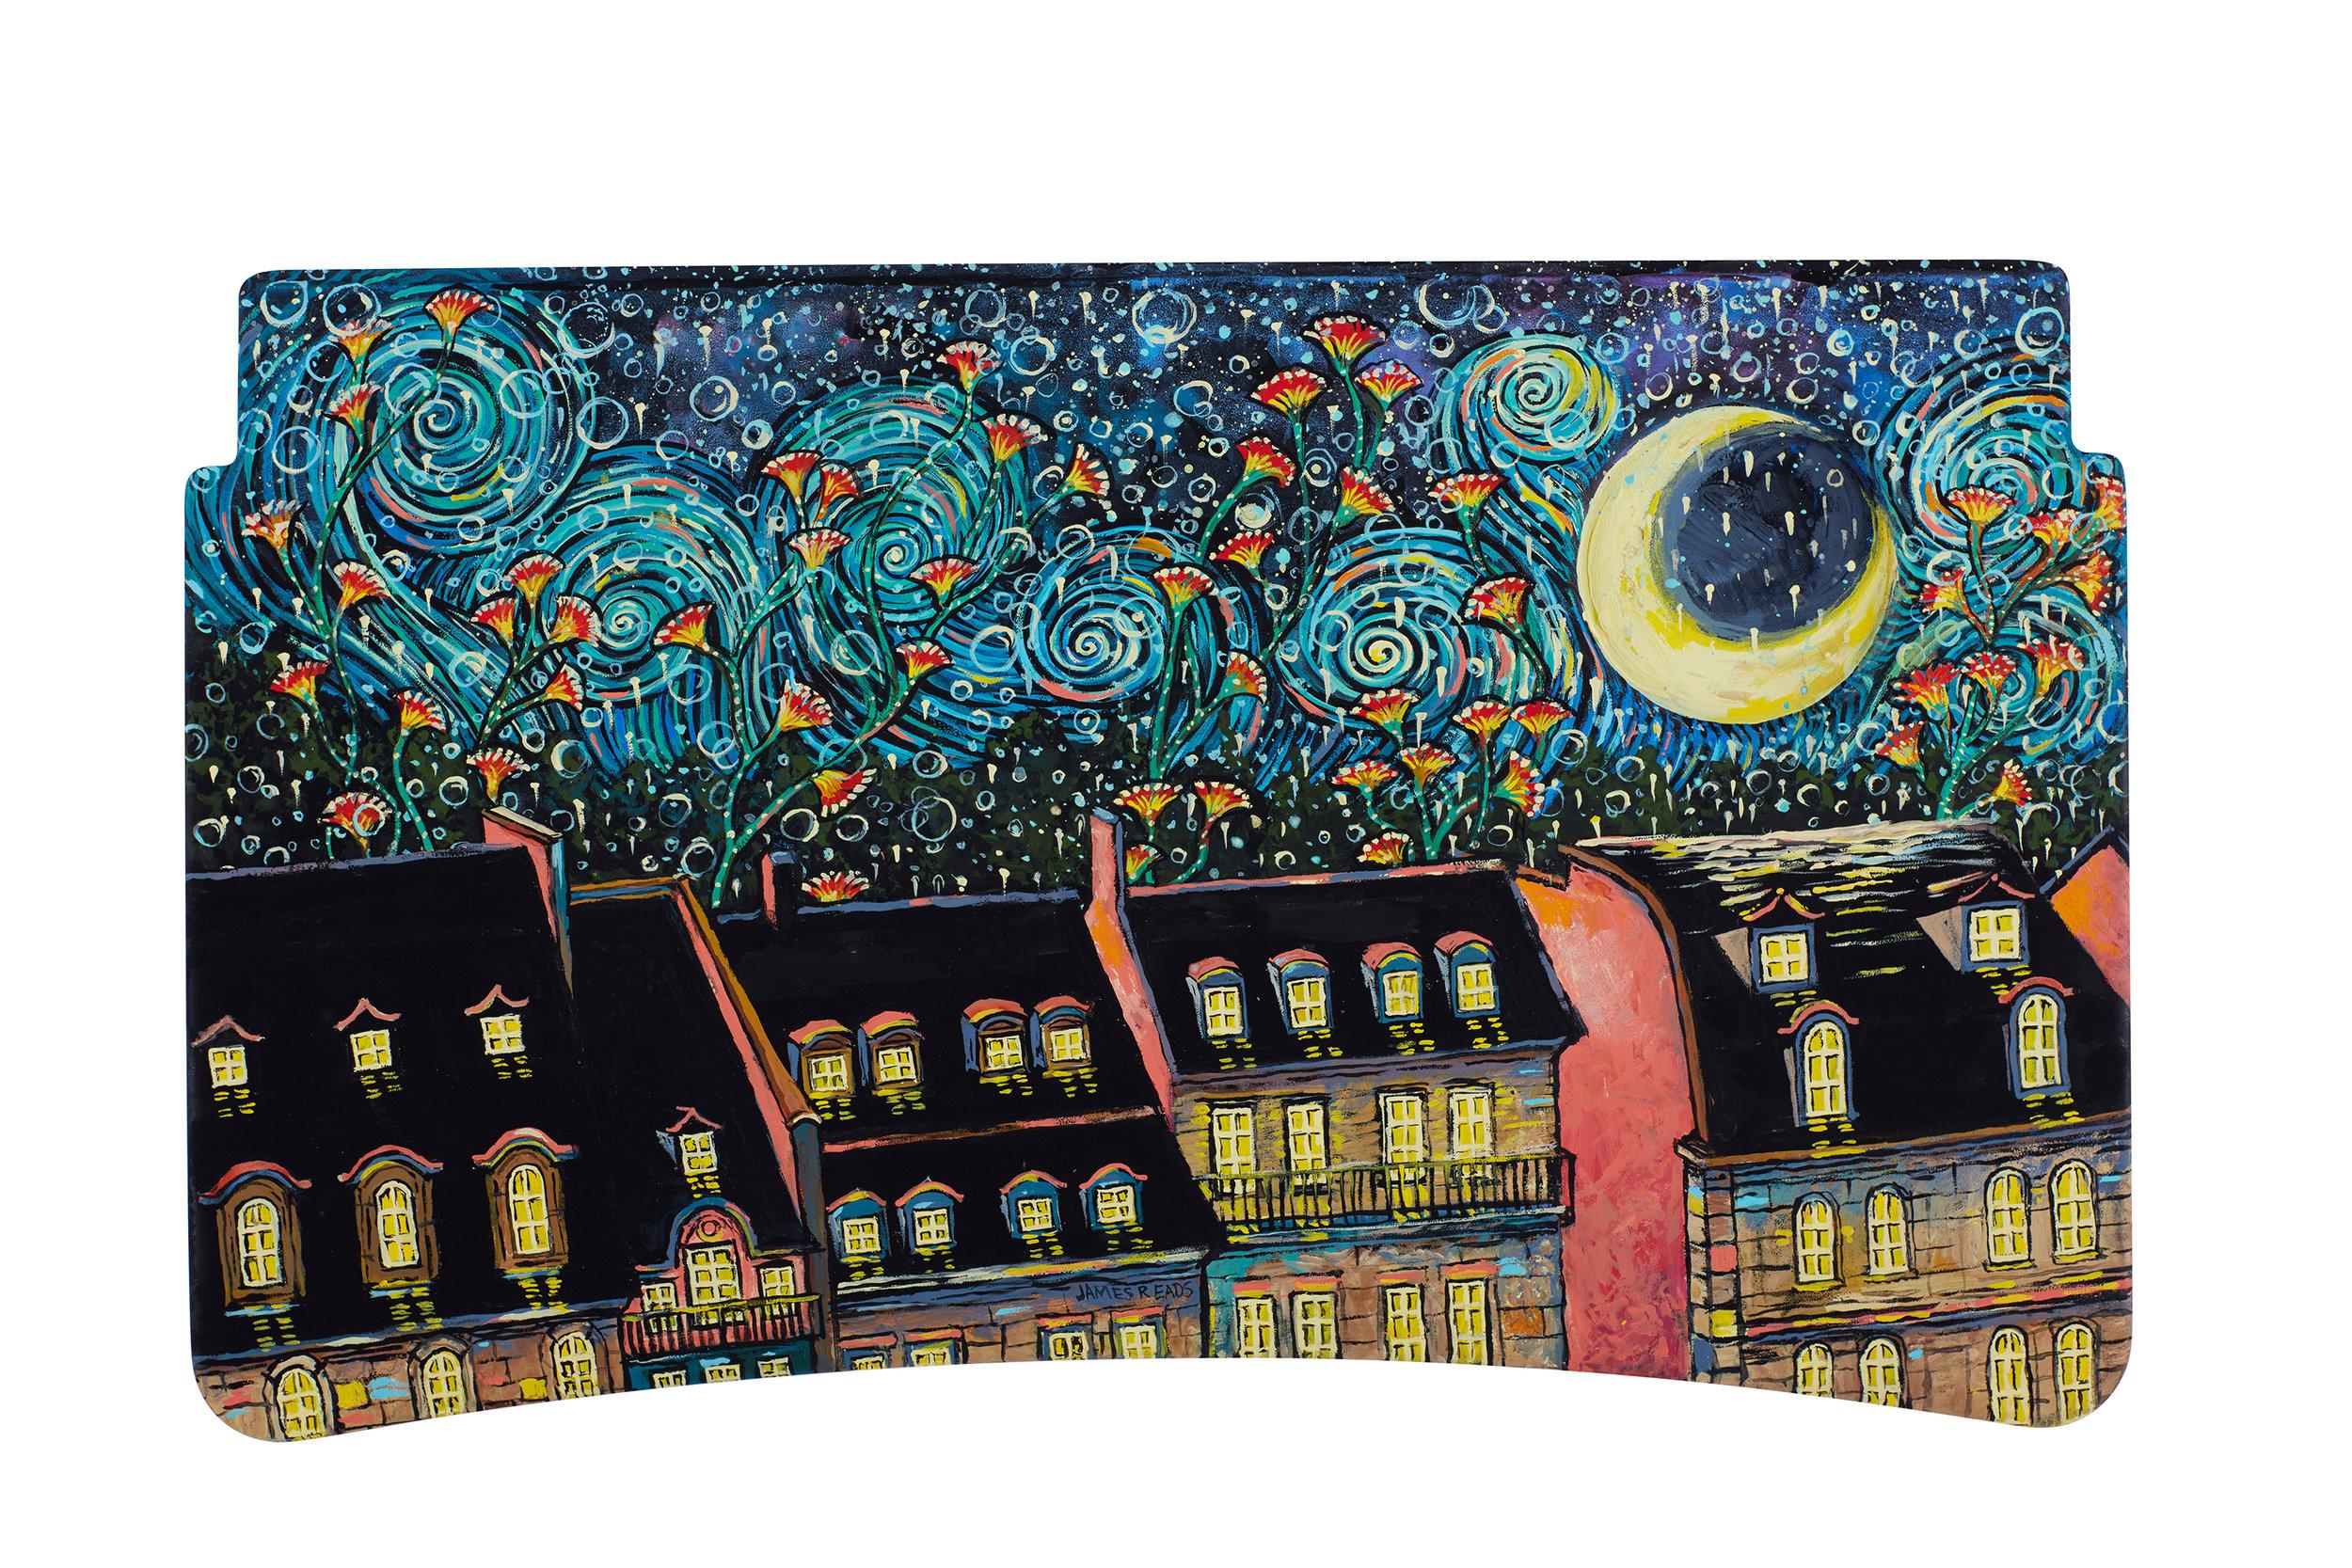 PARIS   Role:Creative Director  Art Director: Rose Sacktor Artist: James R. Eads